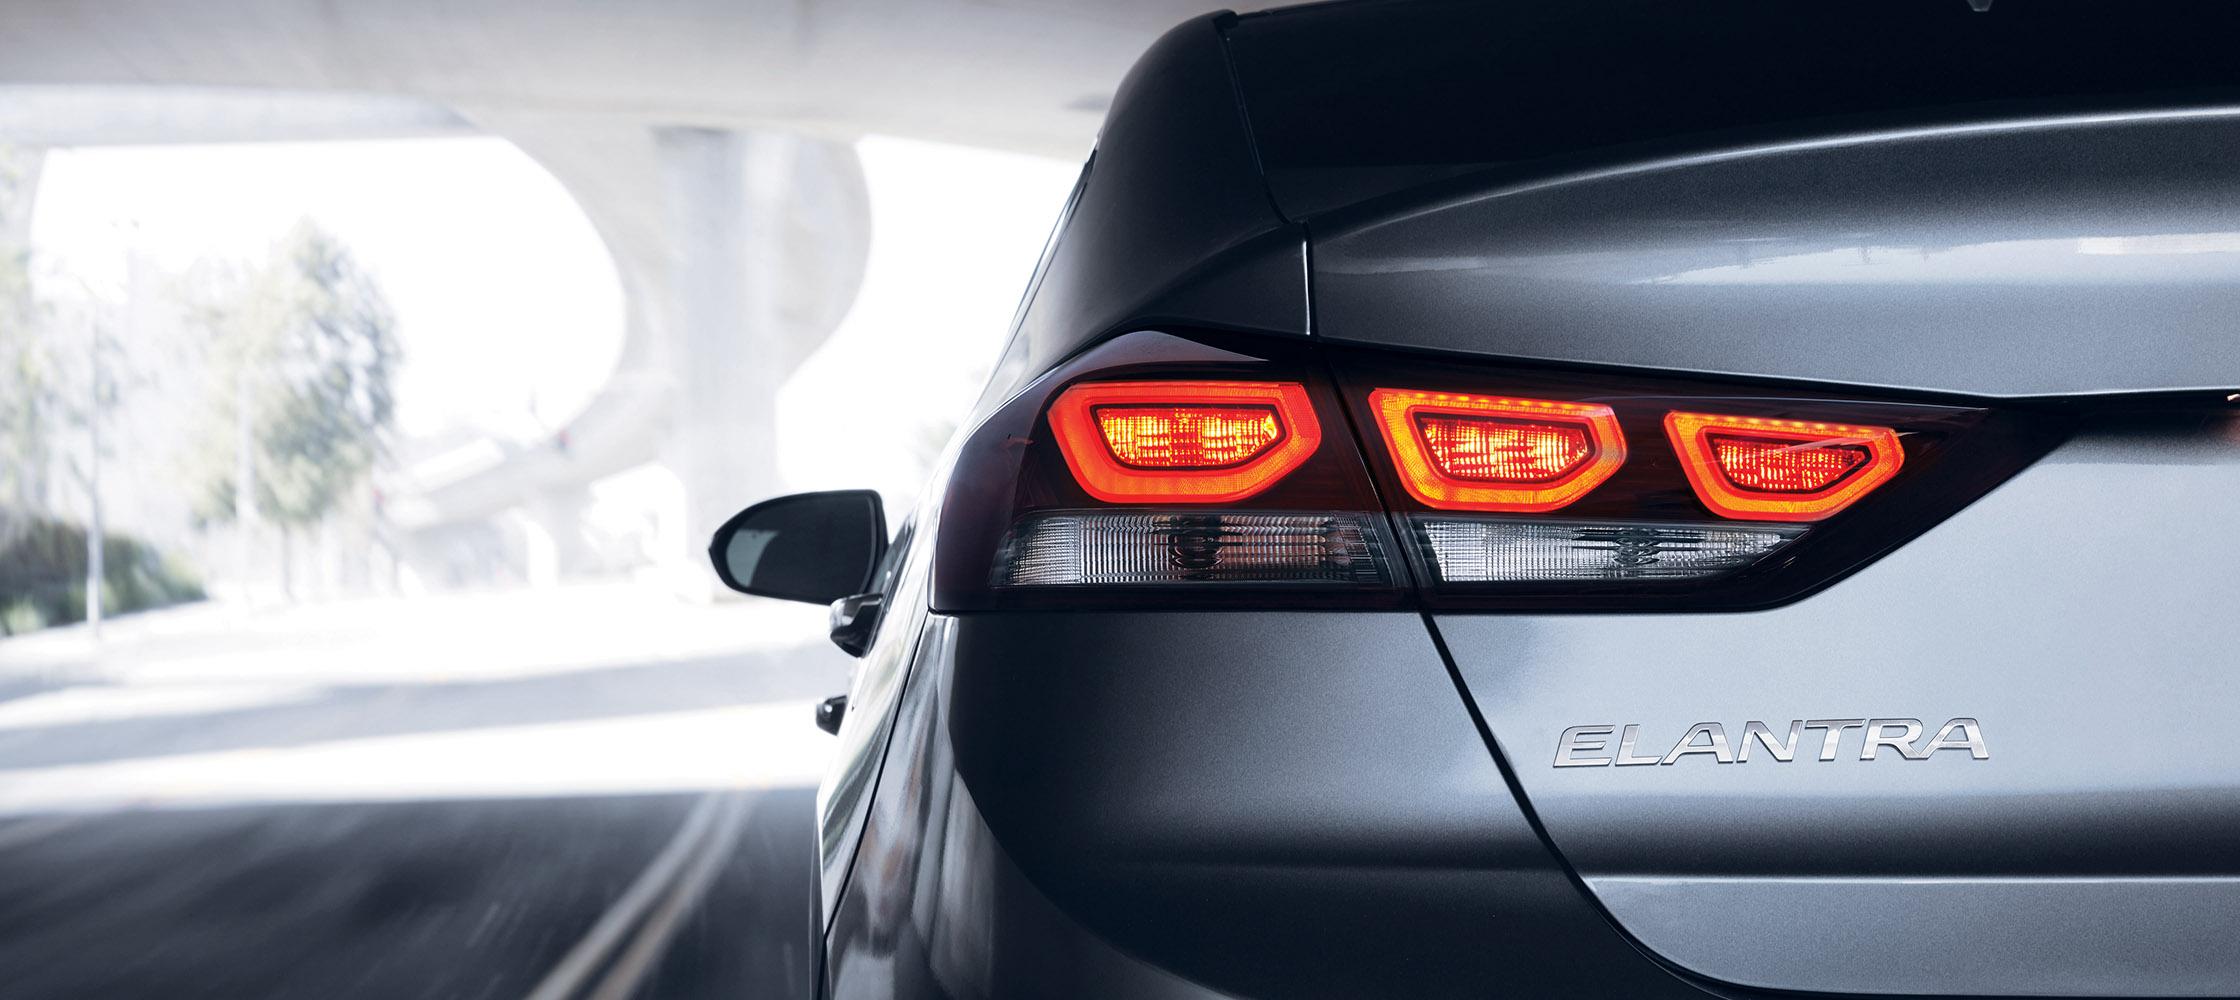 2018 Hyundai Elantra Performance Overview